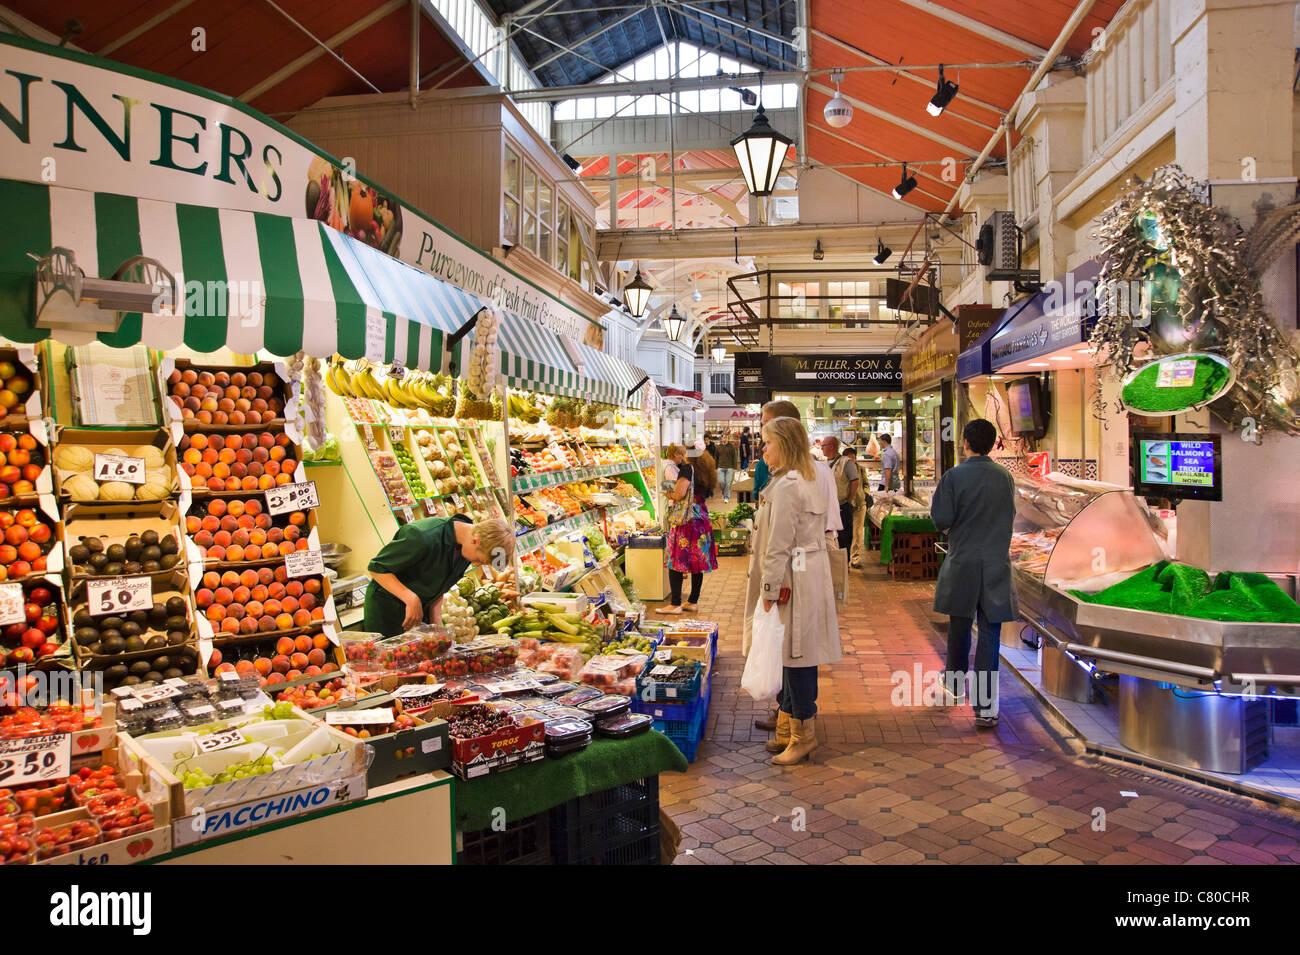 Imbissbuden in der Markthalle, Oxford, Oxfordshire, England, UK Stockbild